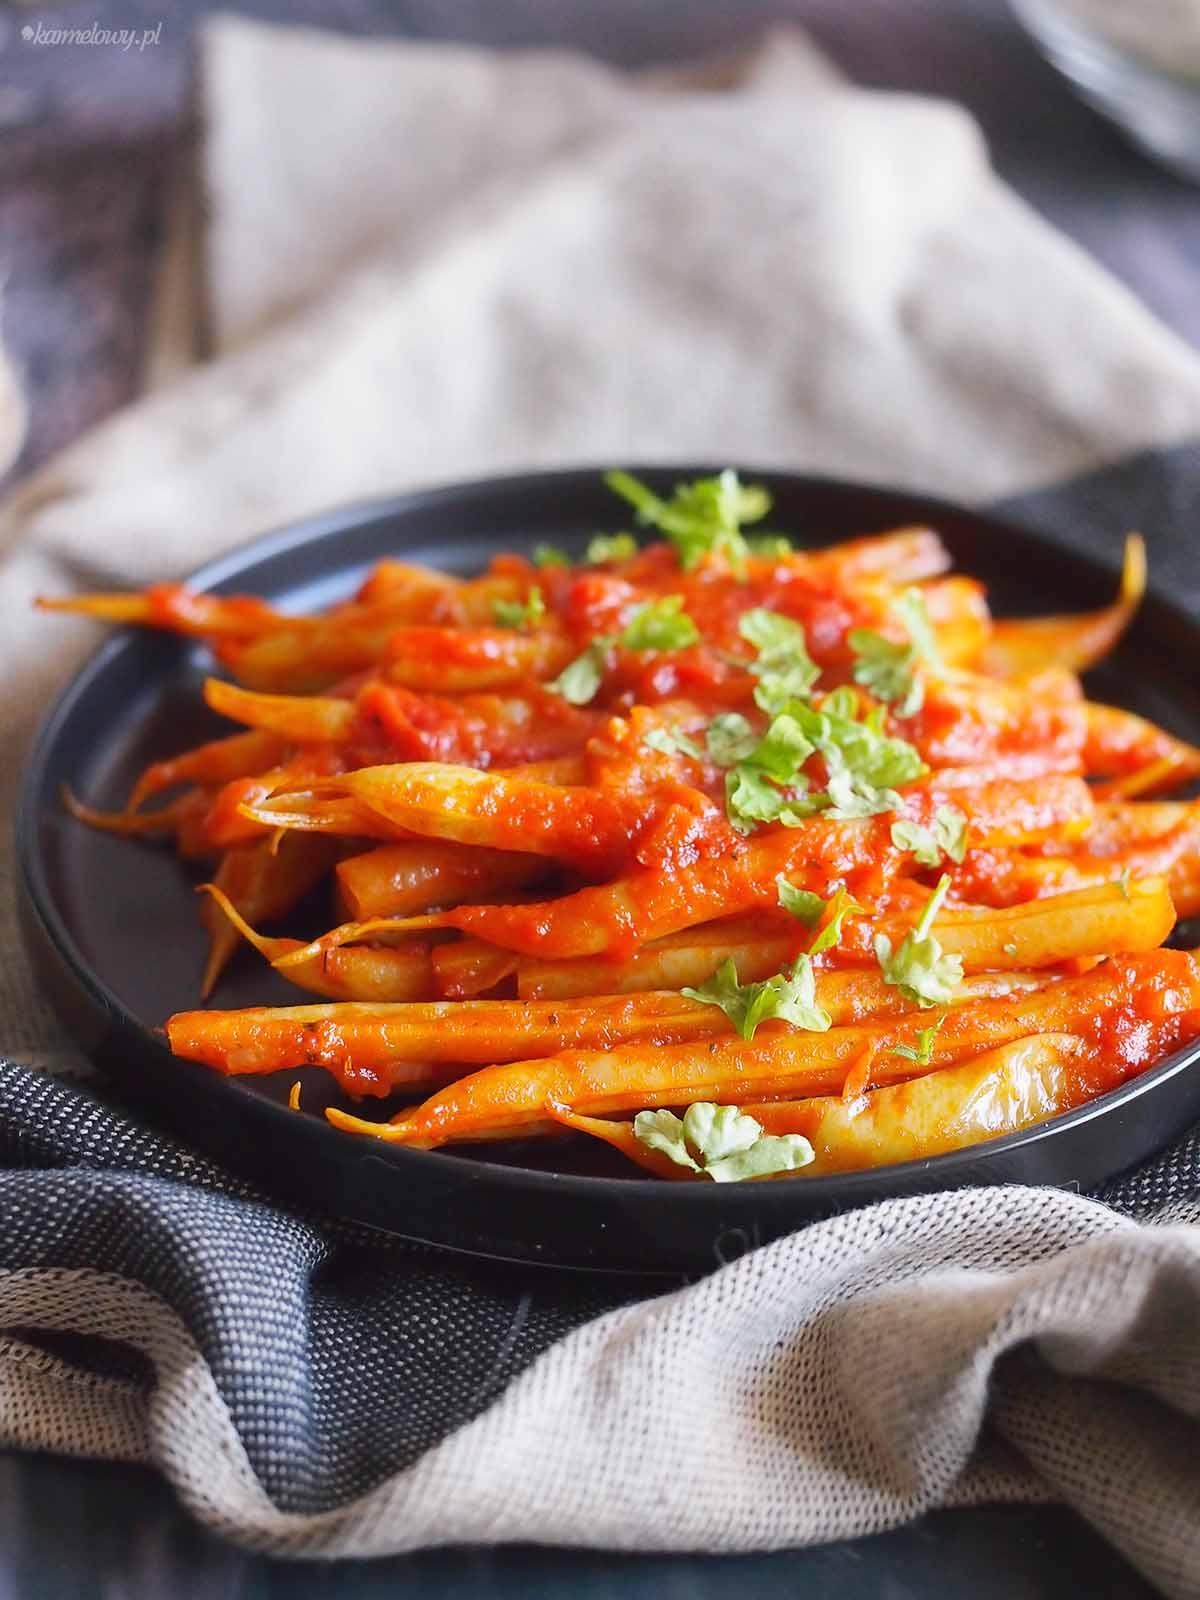 Fasolka-szparagowa-w-pomidorach-Yellow-beans-with-tomato-sauce